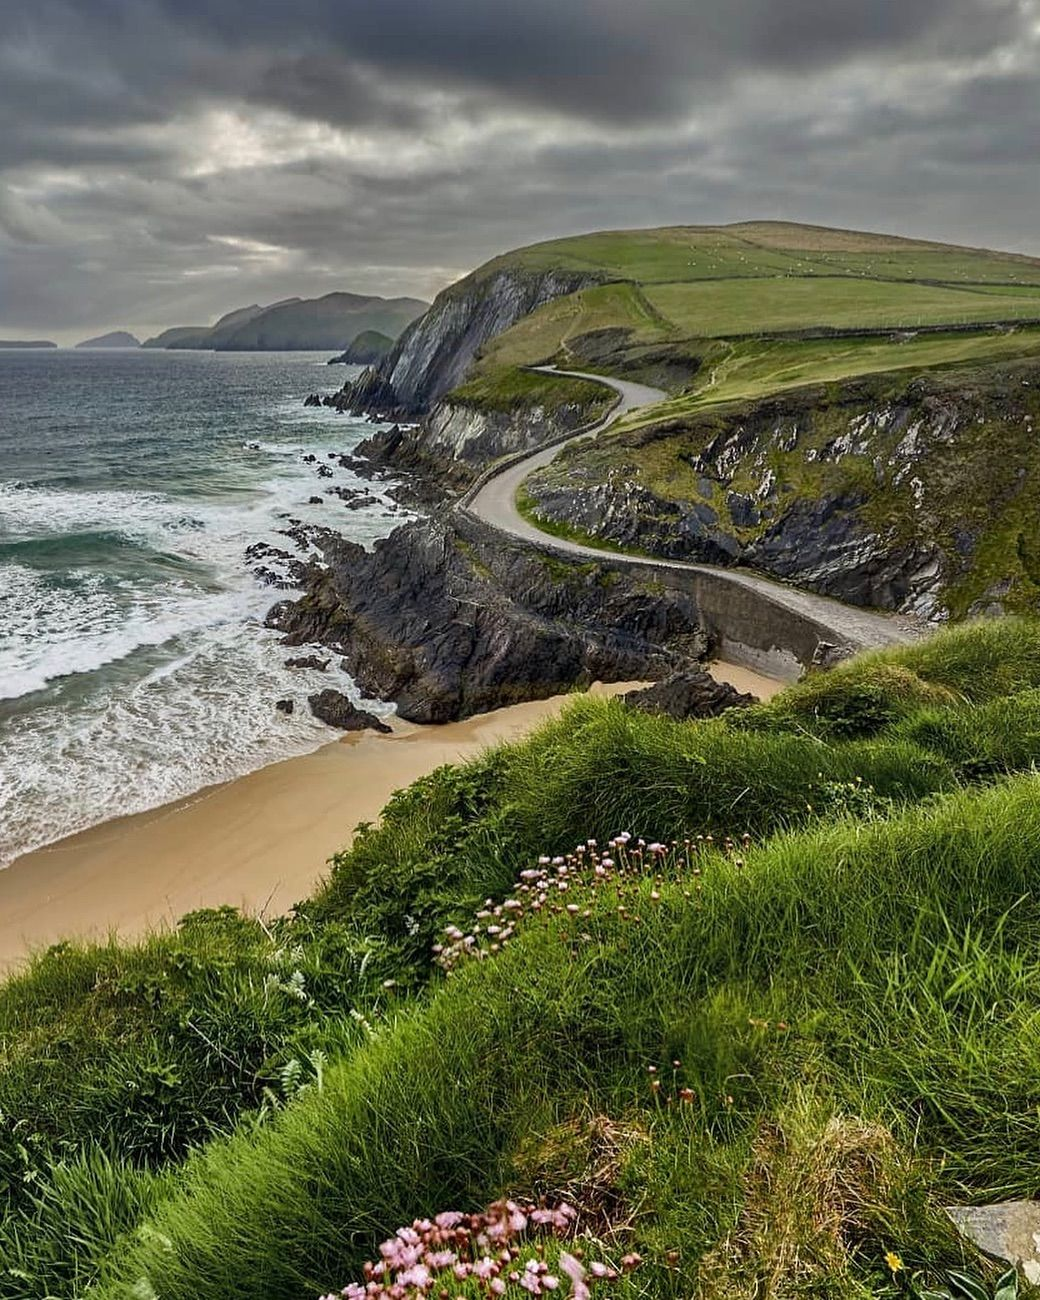 Slew Head Drive Dingle Peninsula Co Kerry Ireland Image By Jorn Petersen Marvelatireland Images Of Ireland Ireland Travel Travel